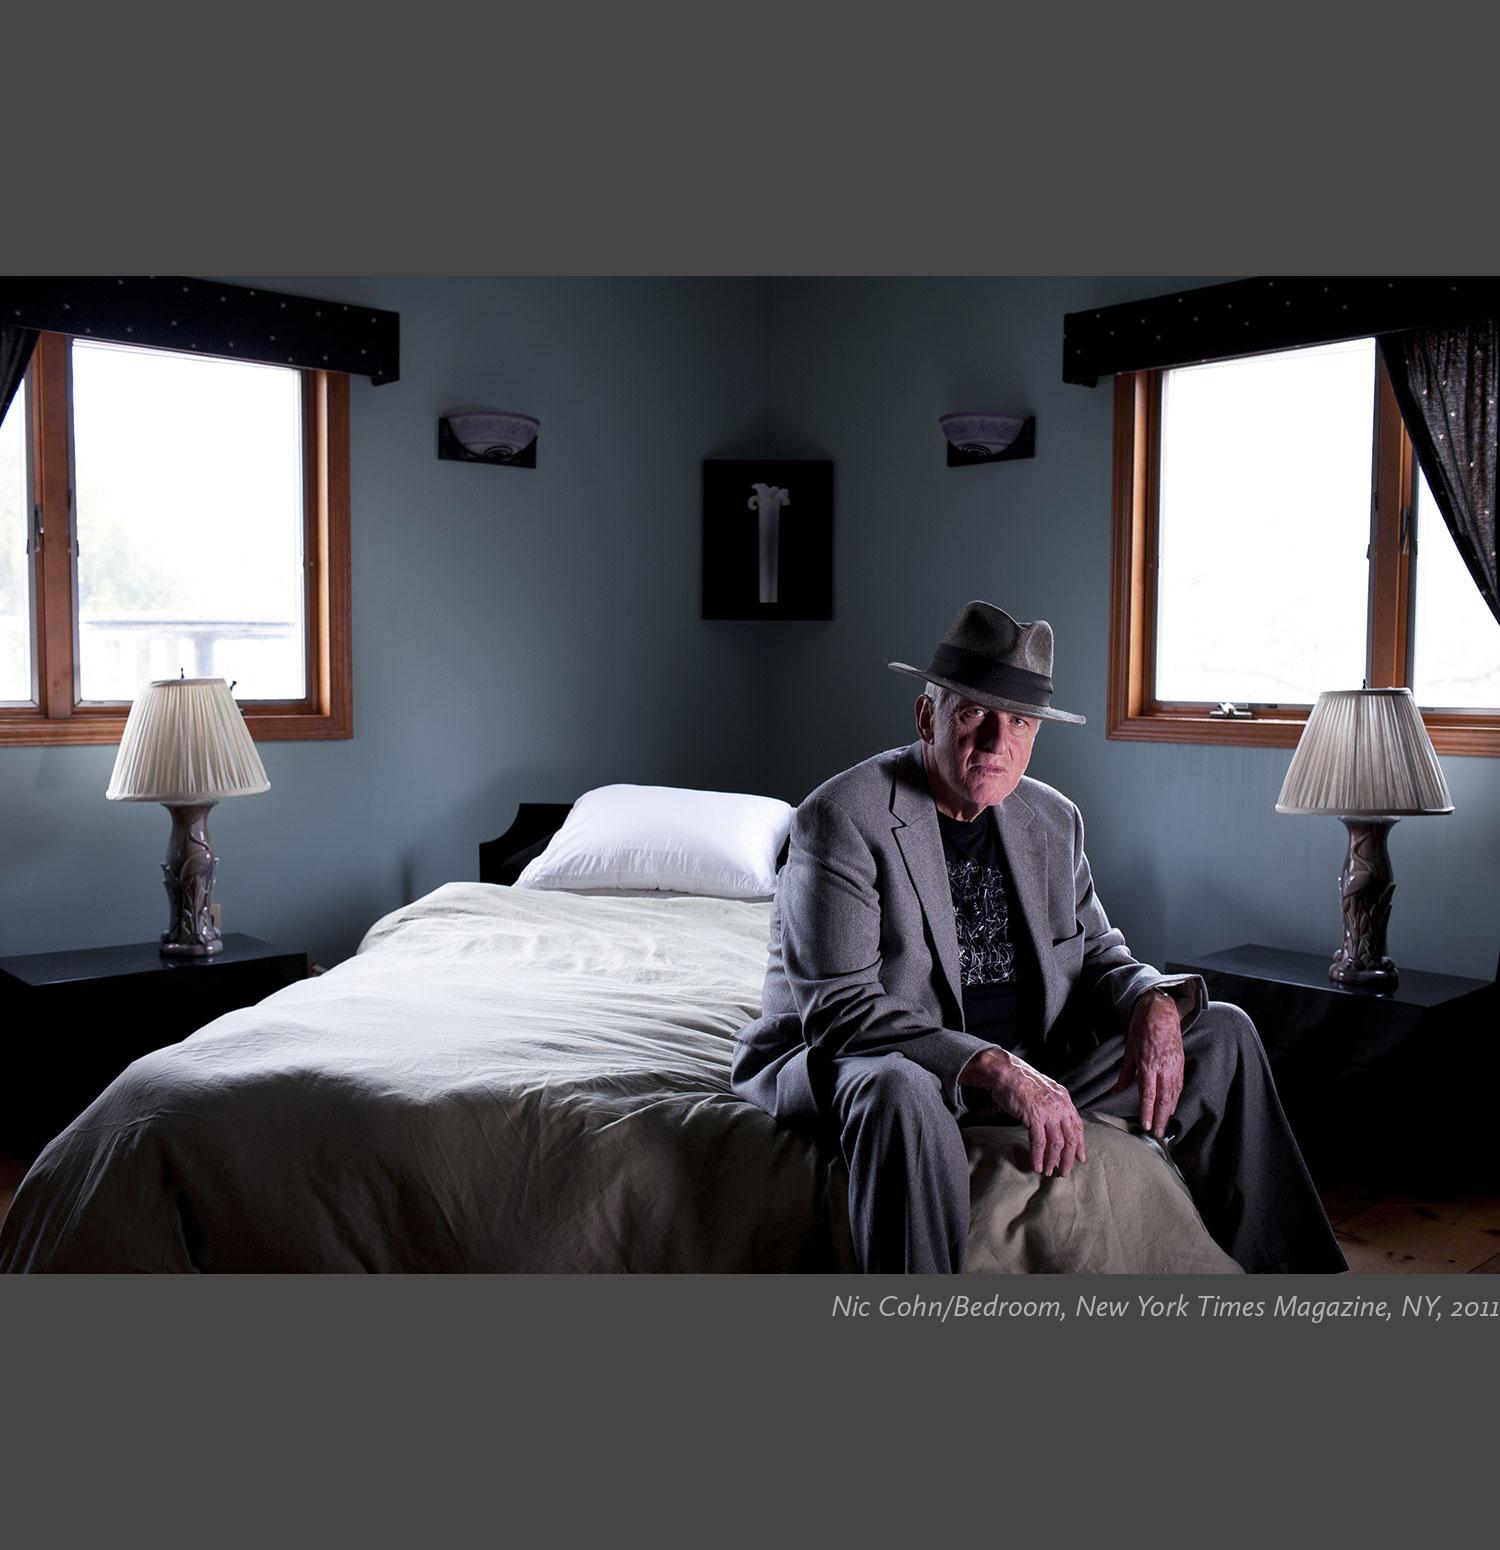 15_Nic_Cohn_Bedroom_New_York_Times_Magazine_NY-2011.jpg